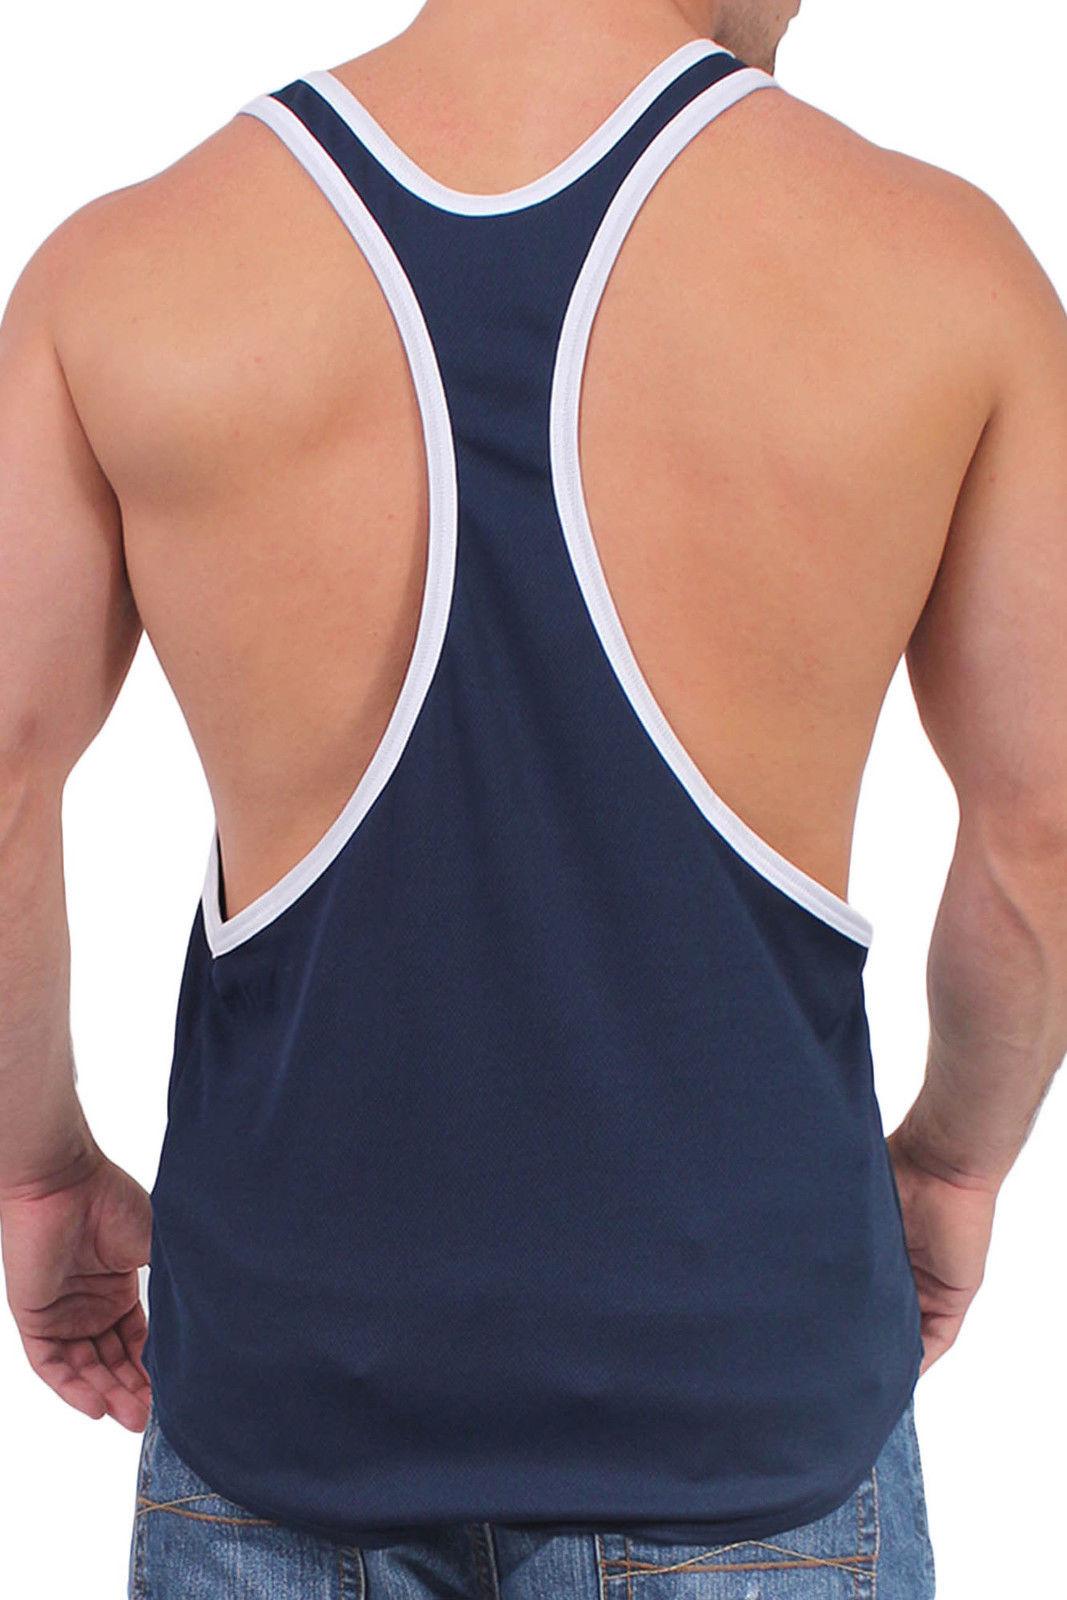 Mens Open Side Muscle Shirt